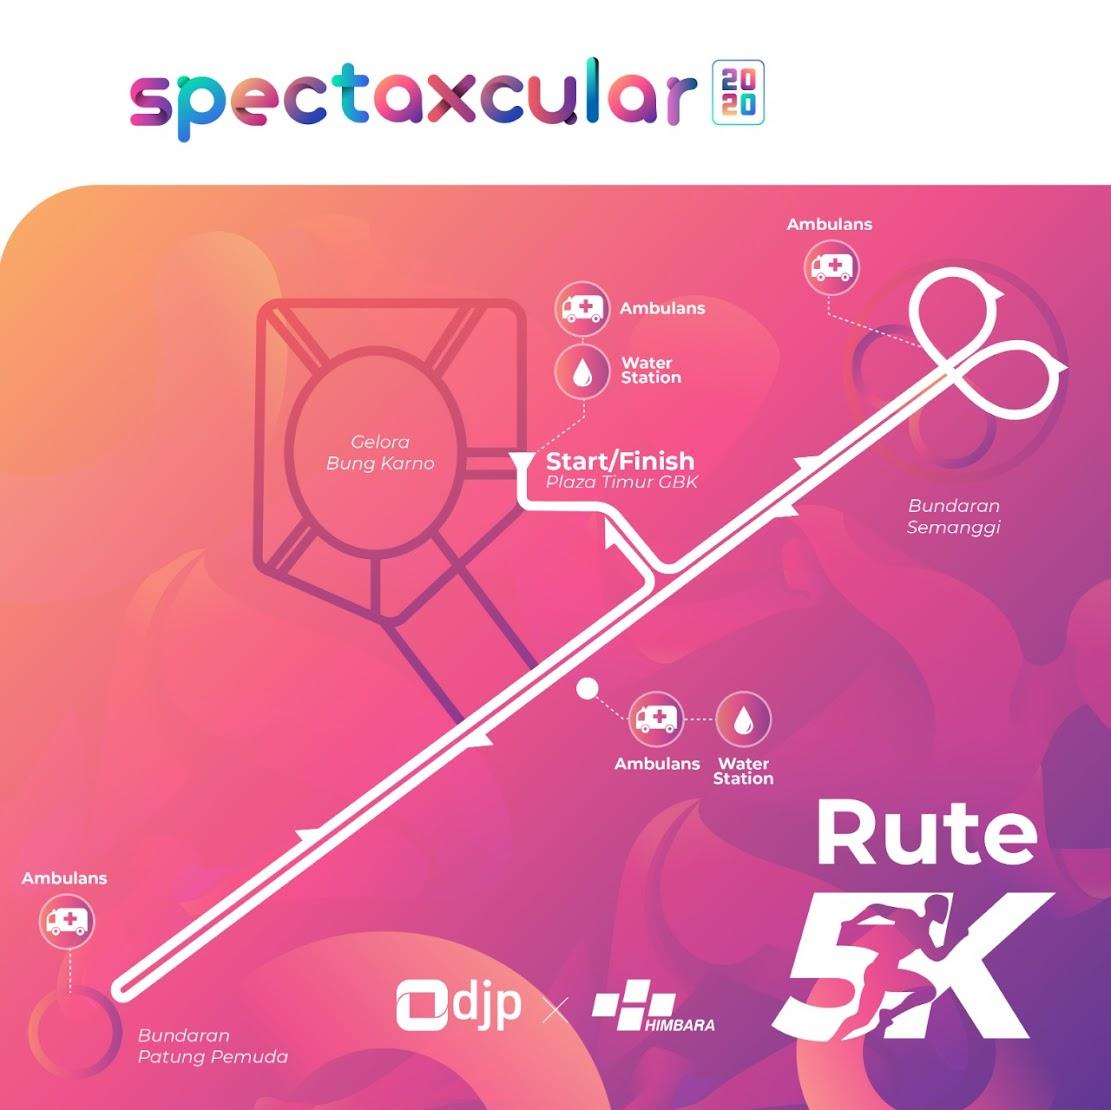 Spectaxcular Run • 2020